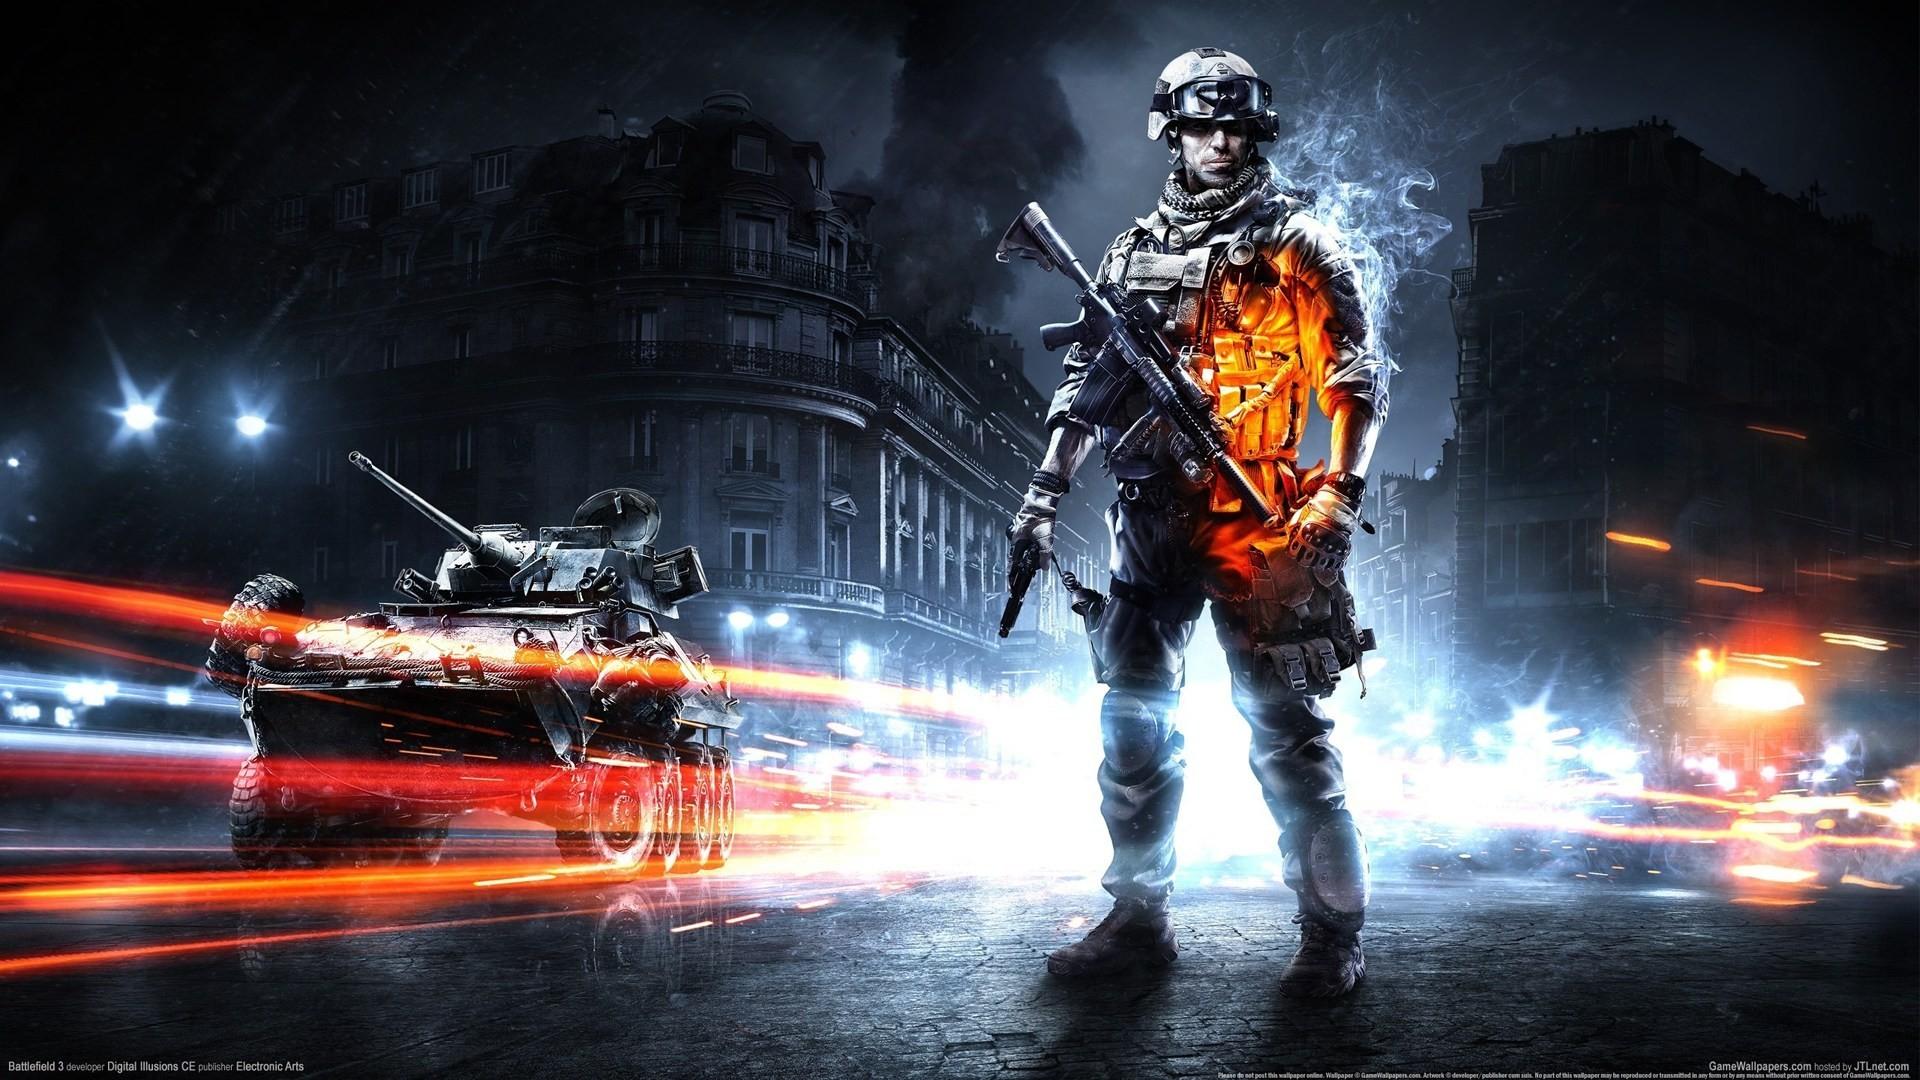 Res: 1920x1080, Battlefield 3 Battlefield 1080p HD Wallpaper Background